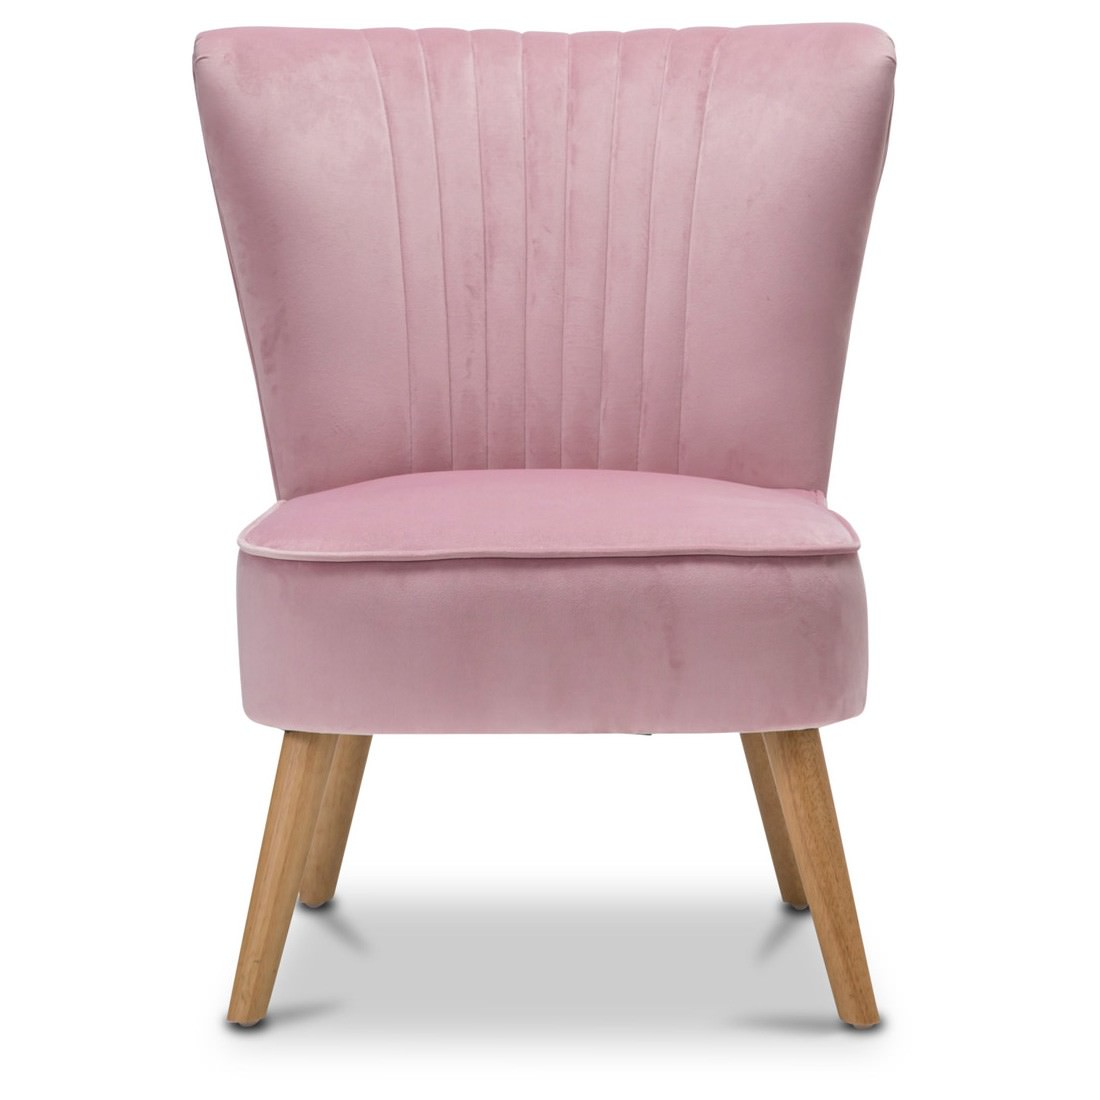 Jessi Velvet Fabric Accent Slipper Chair Blush Pink